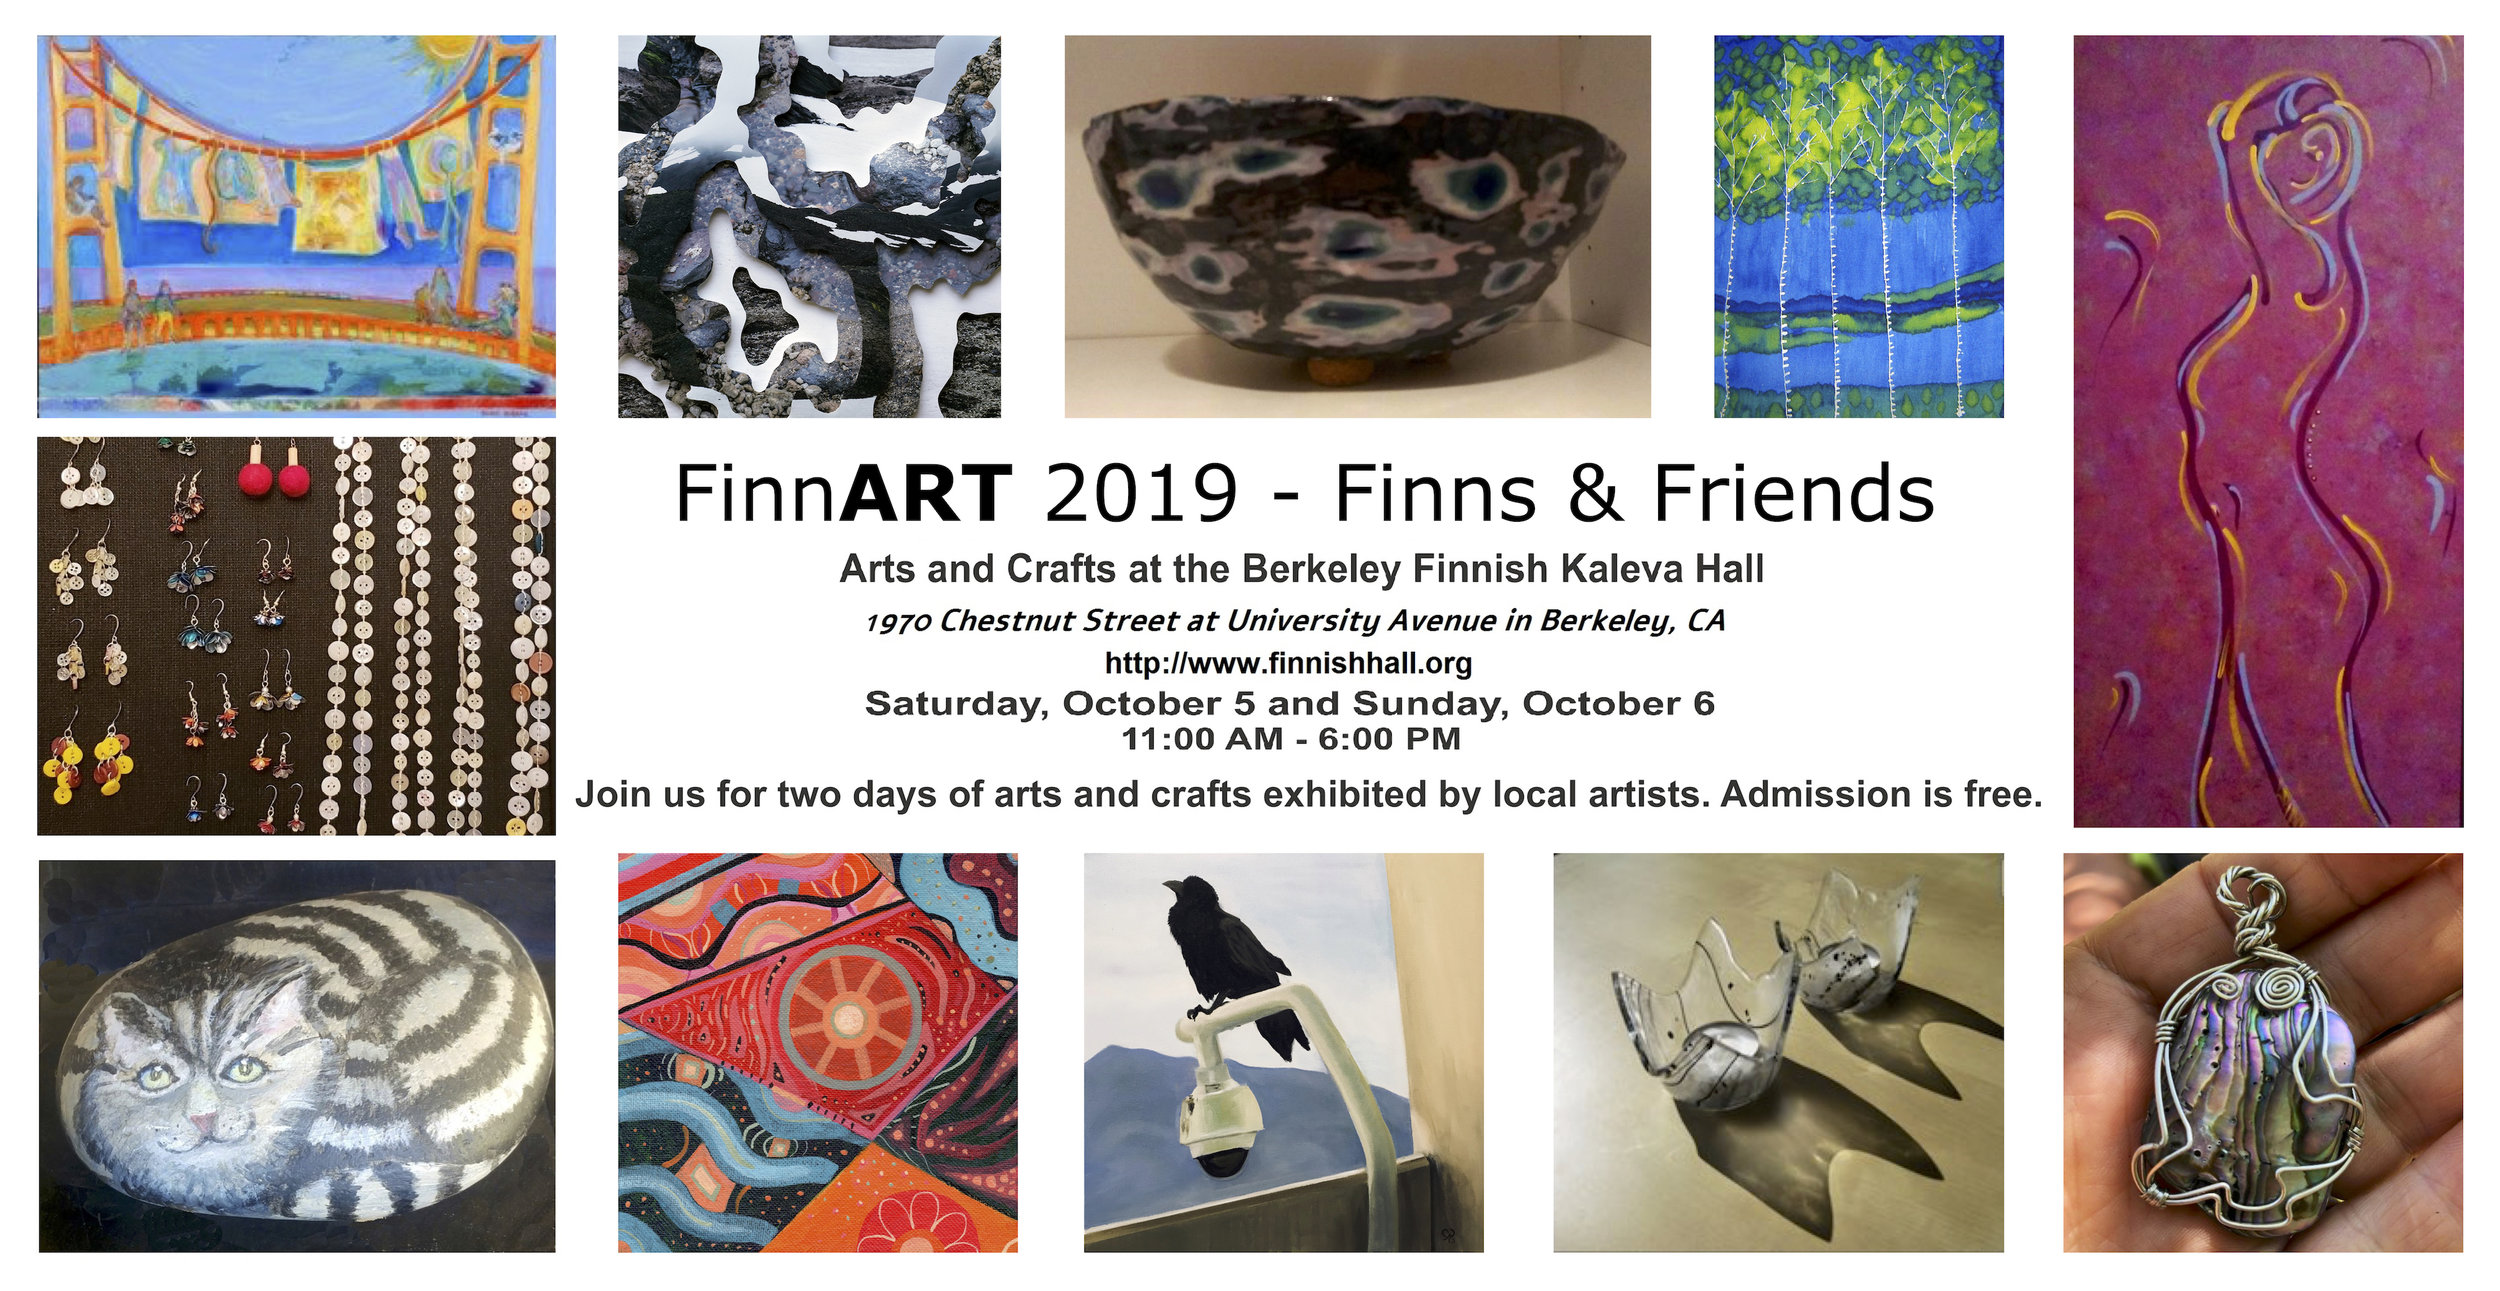 FinnART 2019 - 6.jpg